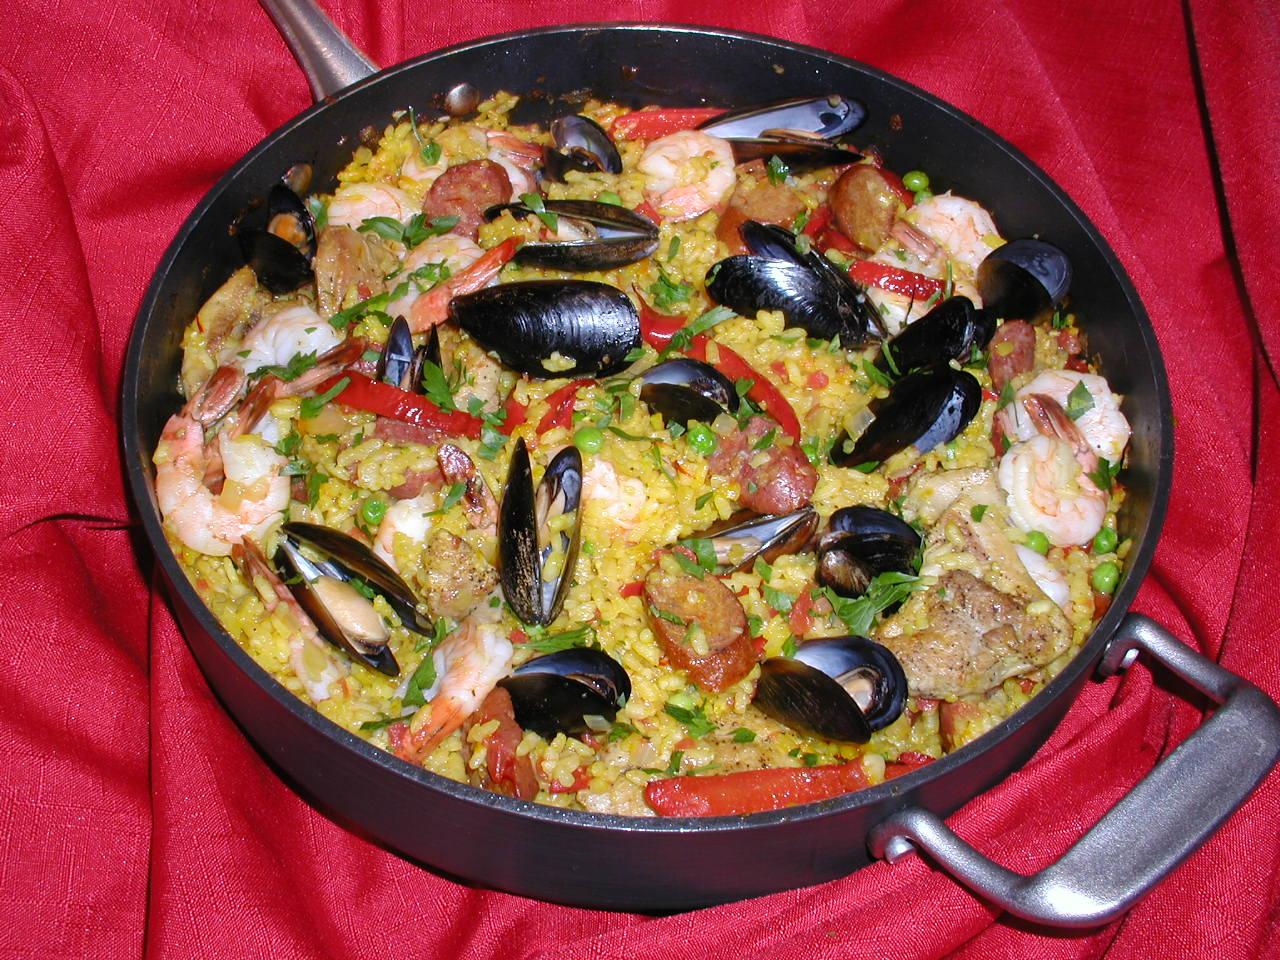 Rice Spanish Dishes Spanish Dish The Rice is